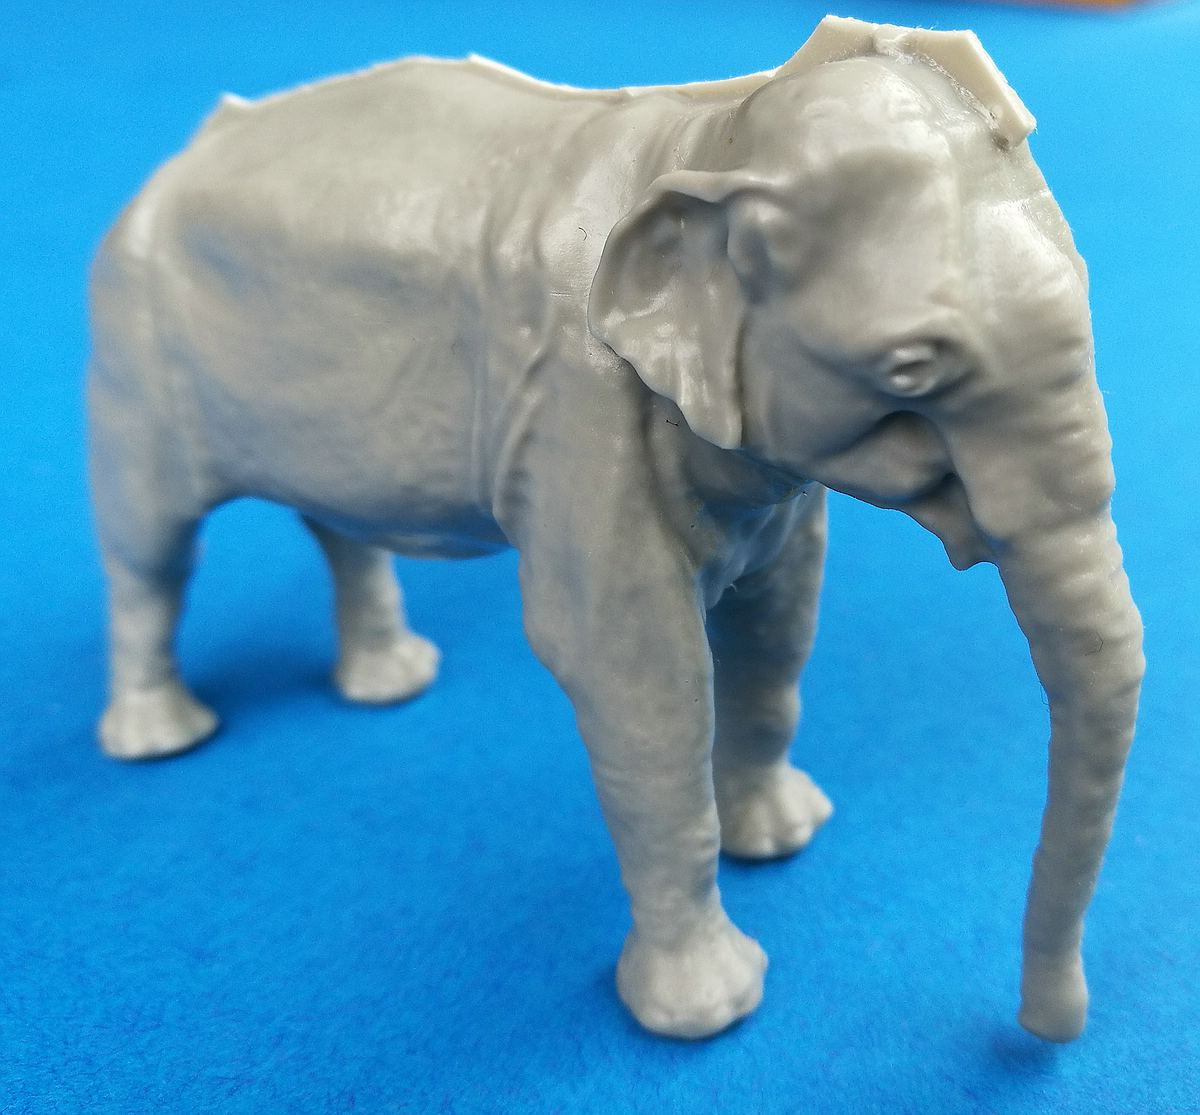 CMK-F48341-Asian-Elephant-6 Asian Elephant im Maßstab 1:48 von CMK/Special Hobby F48 341